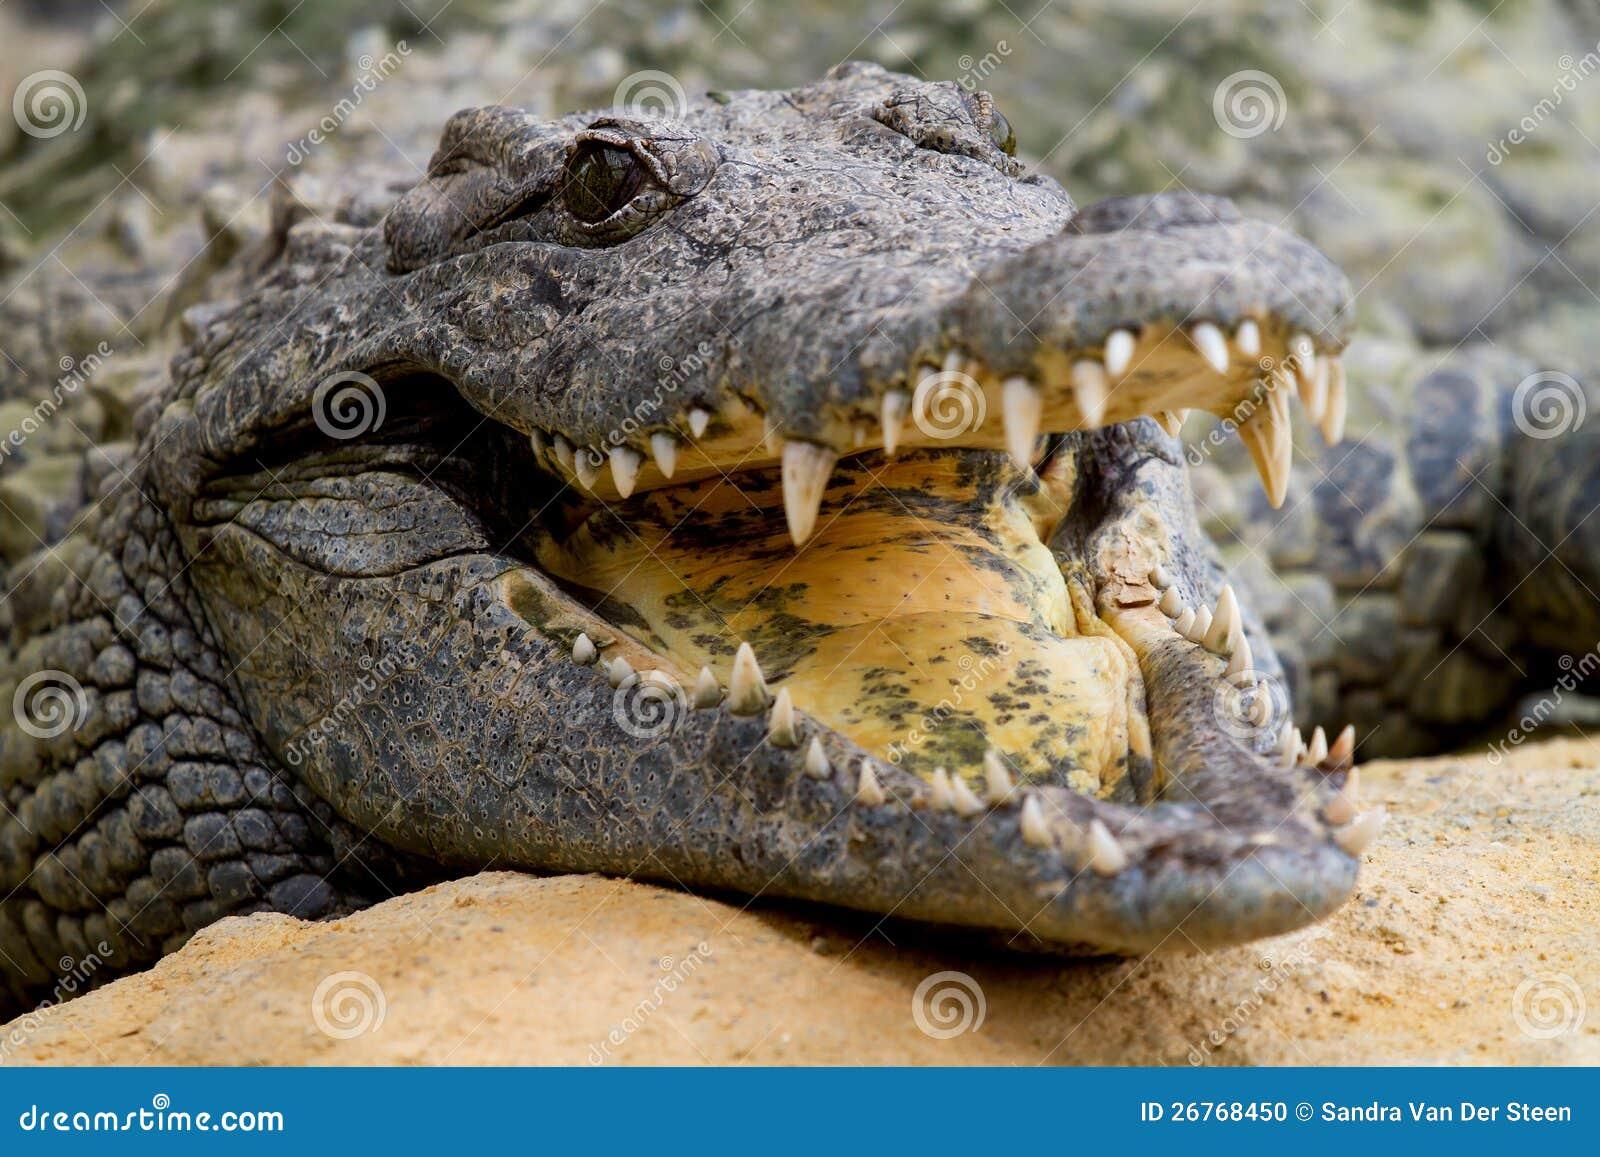 Nile Crocodile Head